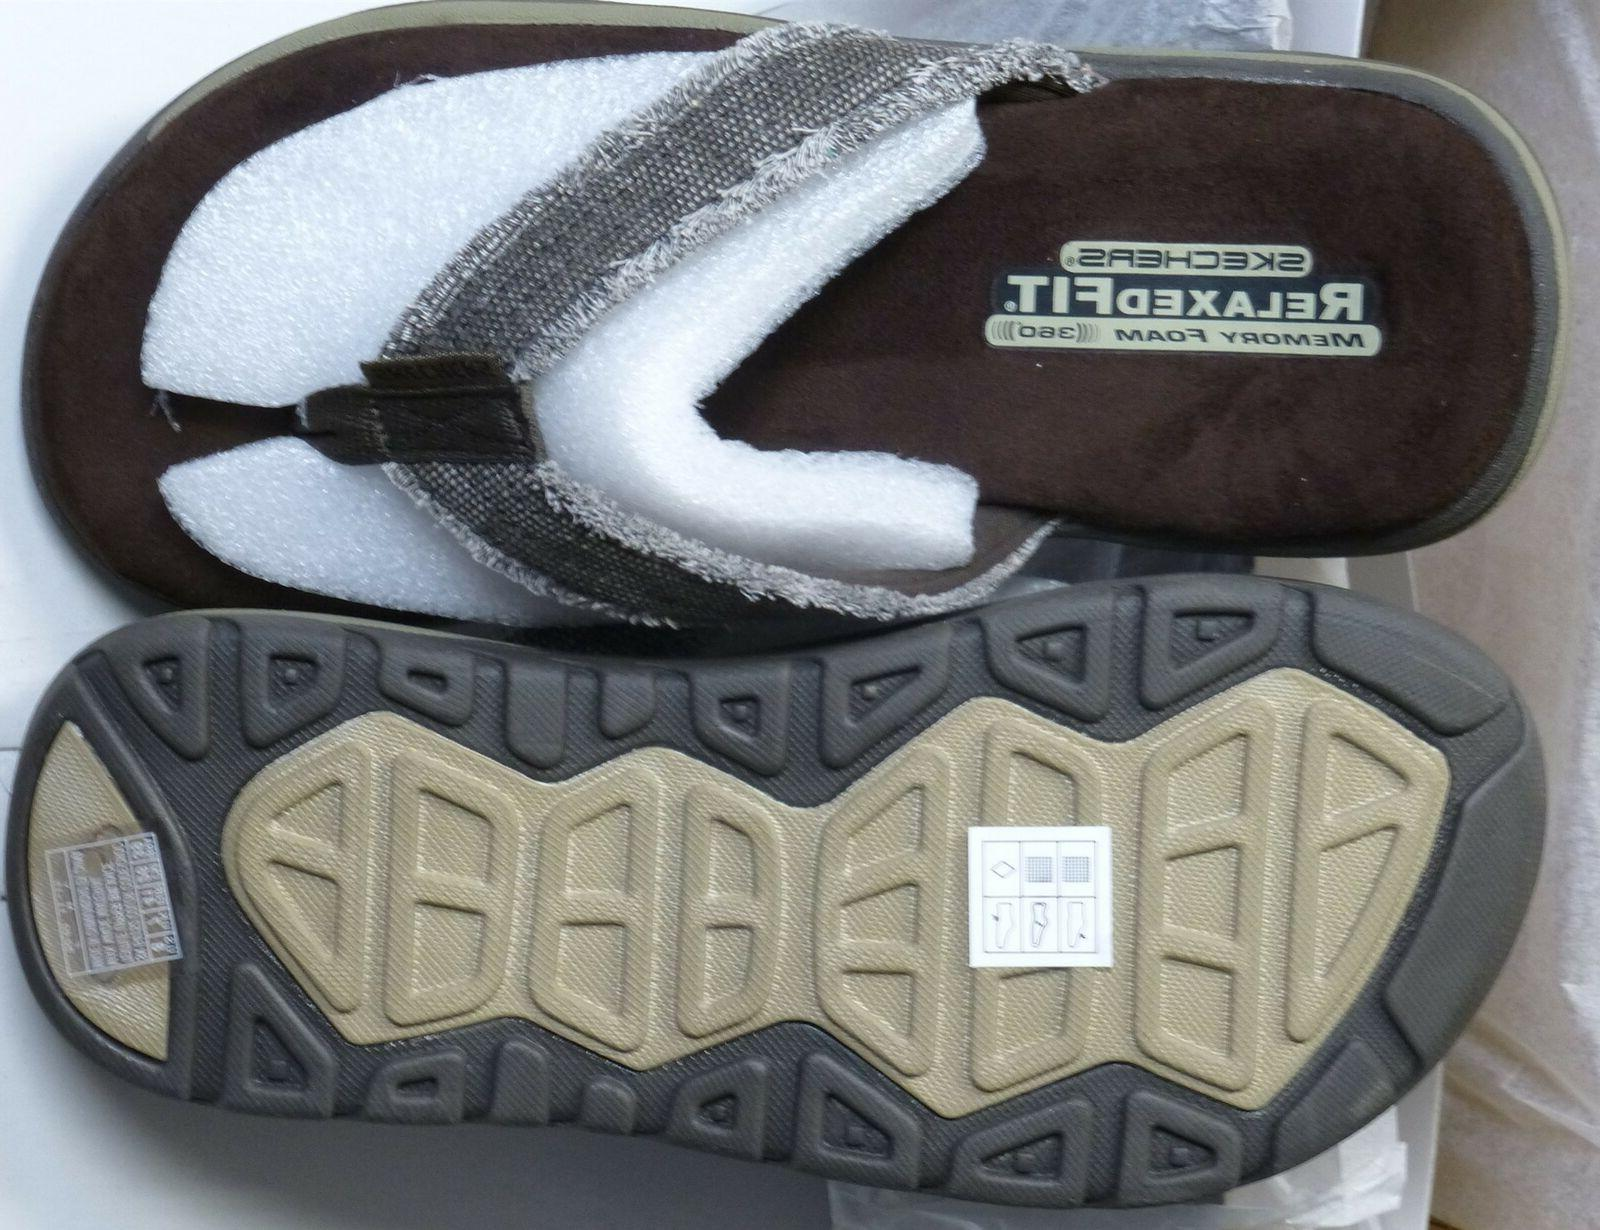 64152 bosnia relaxed fit memory foam 360